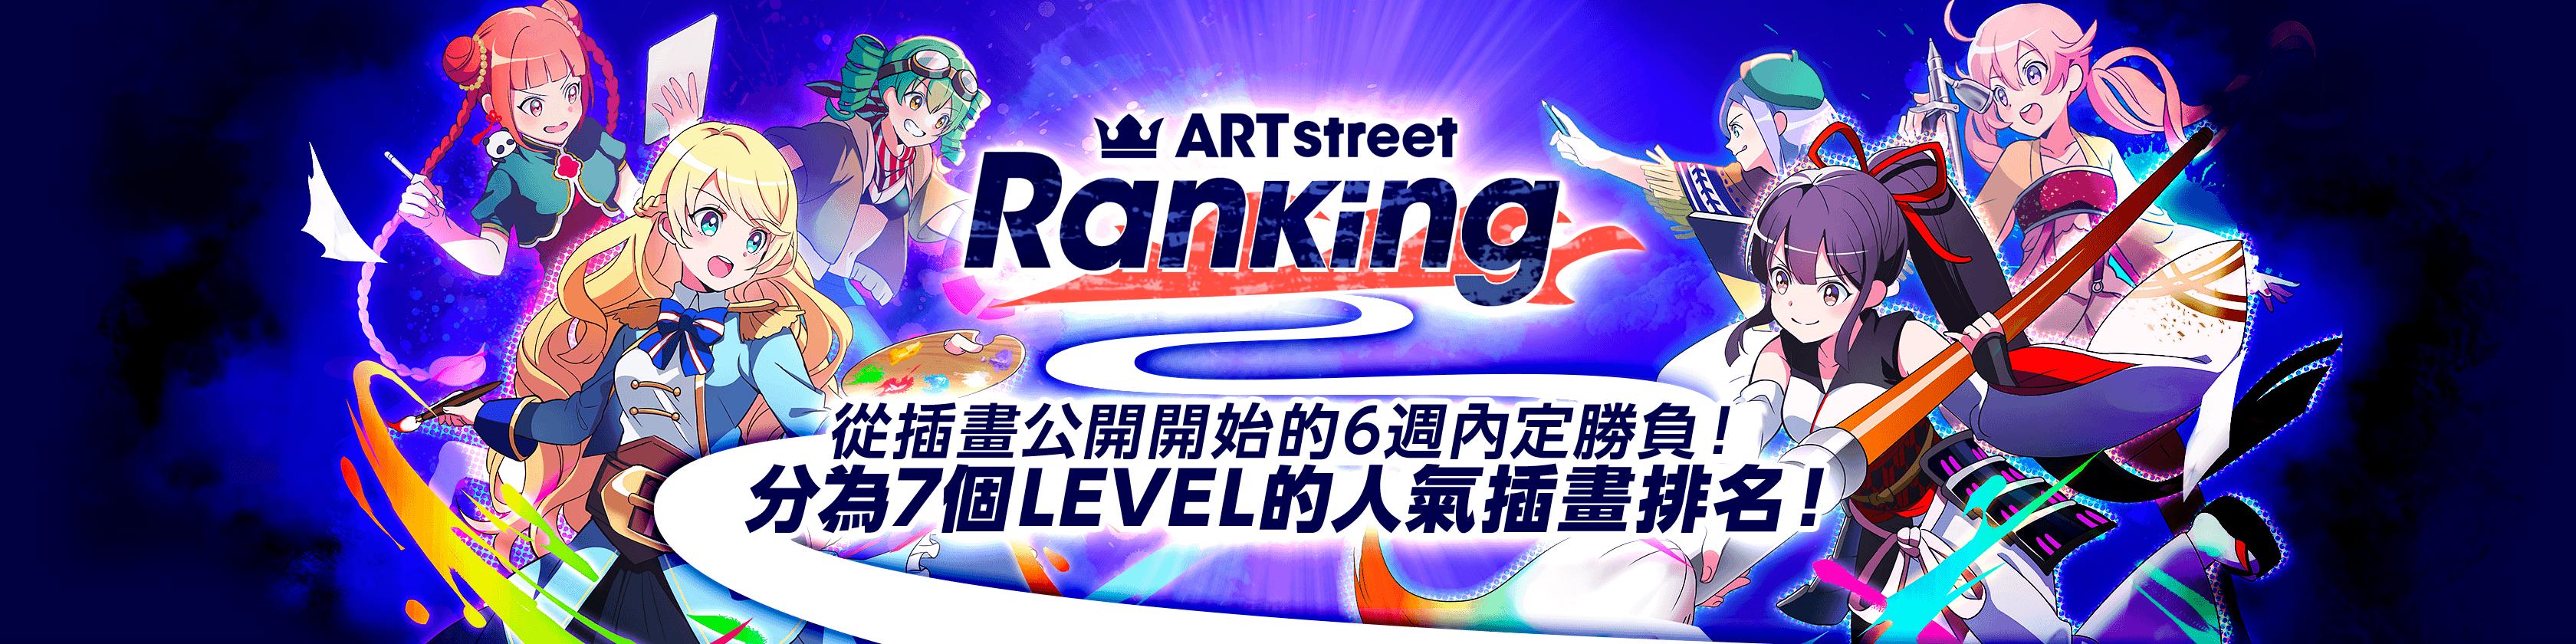 ART street Ranking 插畫競賽